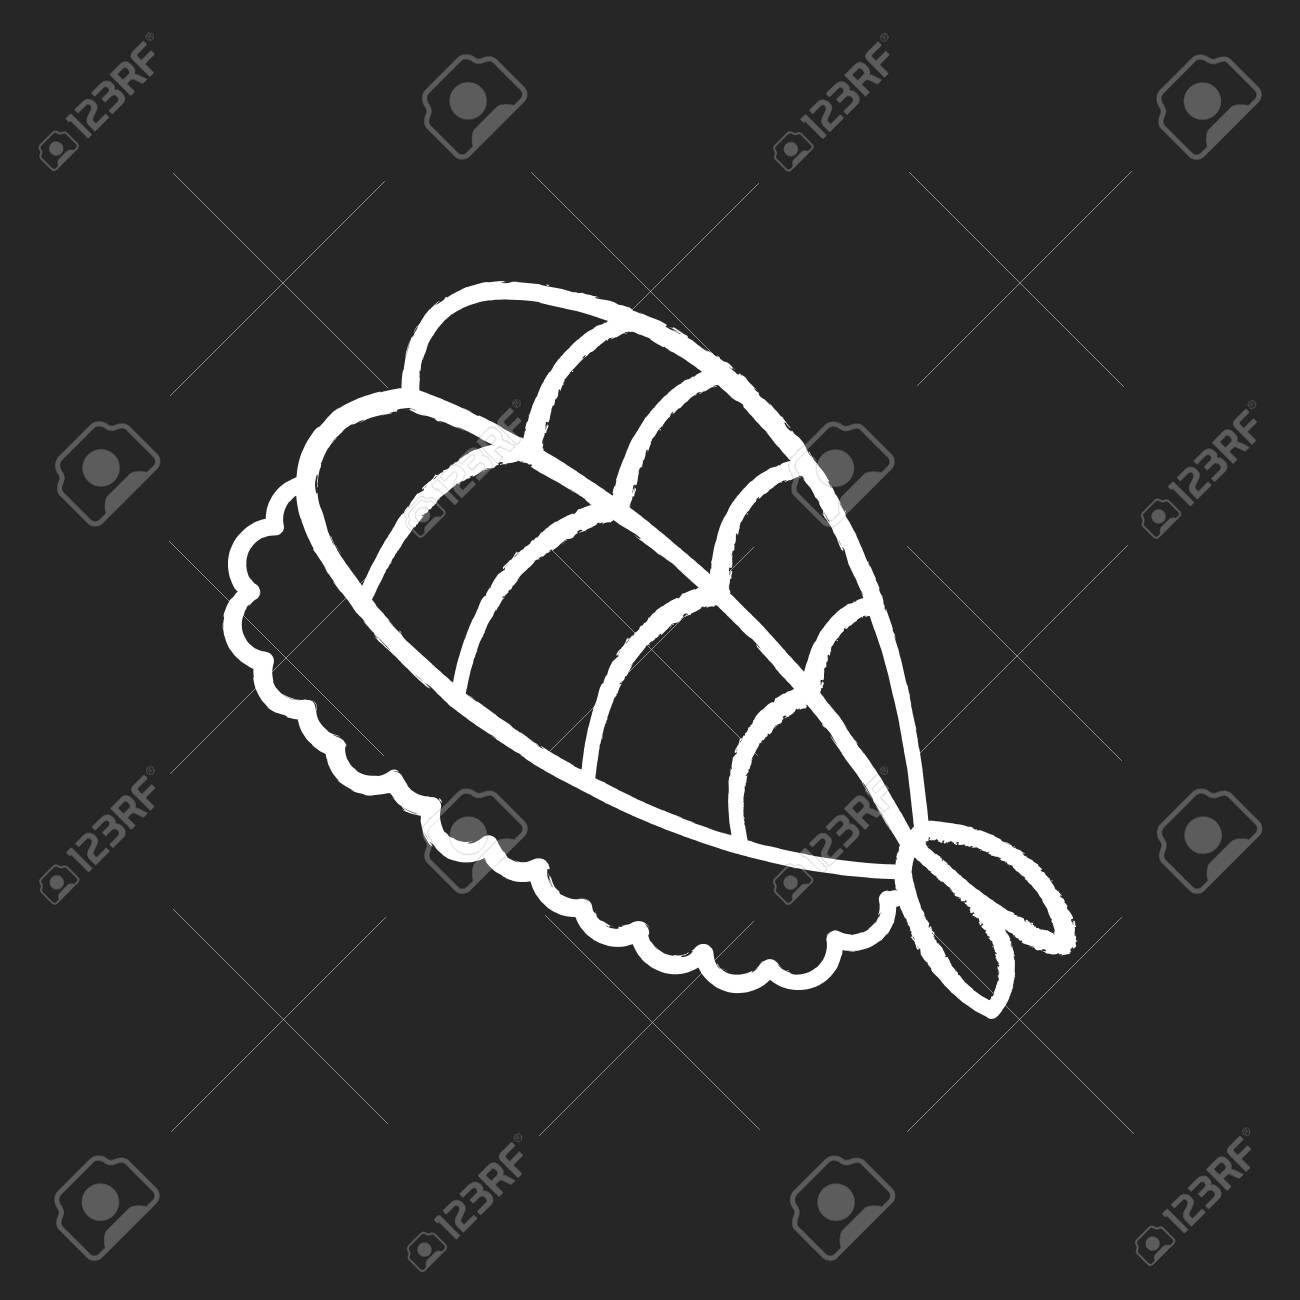 Sushi chalk white icon on black background. Fresh seafood. Sashimi meal. Fish on rice. Traditional japanese cuisine. Asian delicacy. Shrimp, prawn dish. Isolated vector chalkboard illustration - 144436154